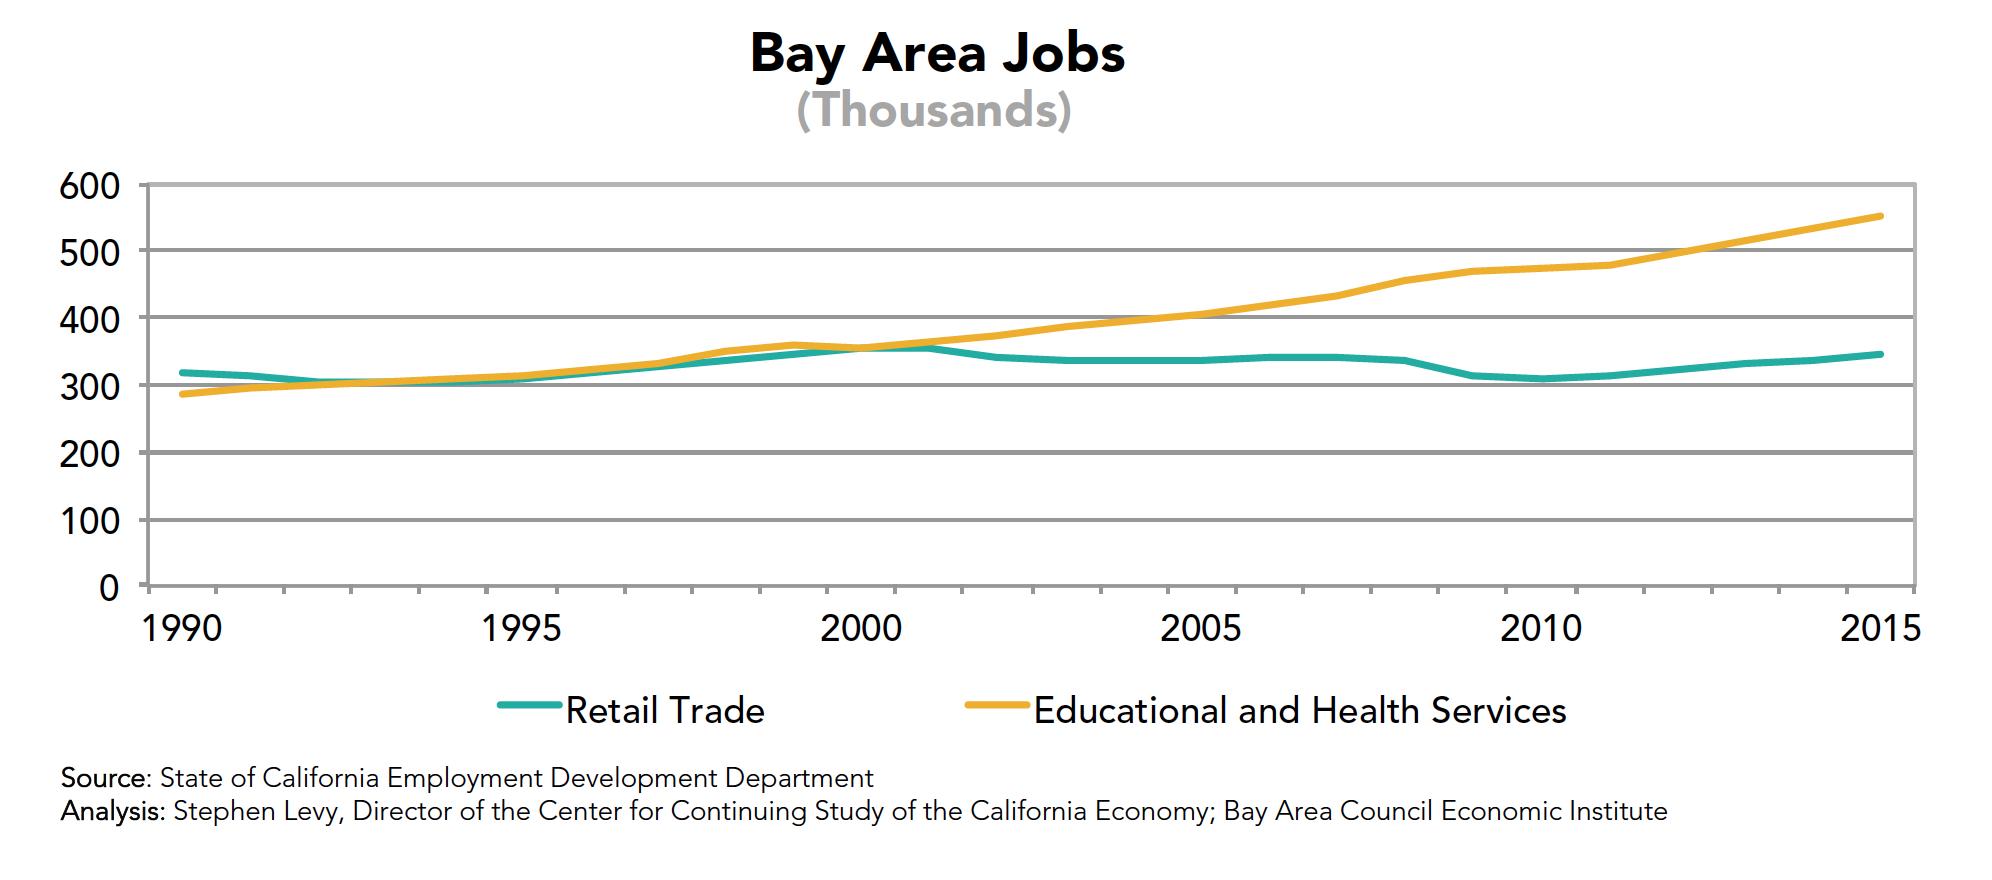 Bay Area Jobs (Retail)